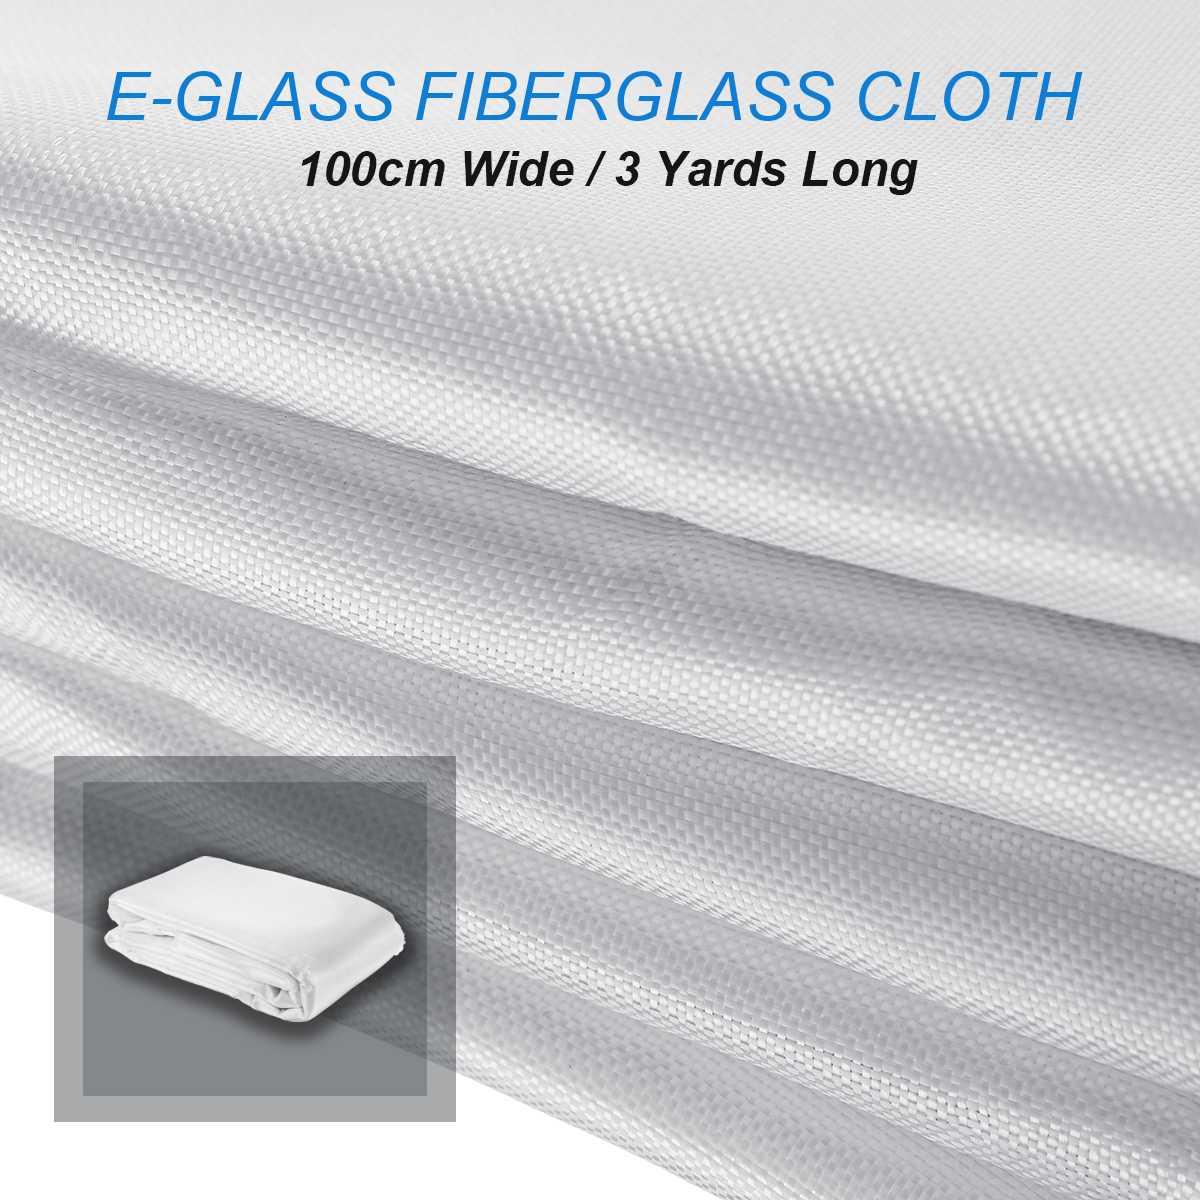 Retardant Emergency Survival Fire Shelter Safety Cover Emergency Blanket Fiberglass Cloth Fire Blanket Fiberglass Fire Flame